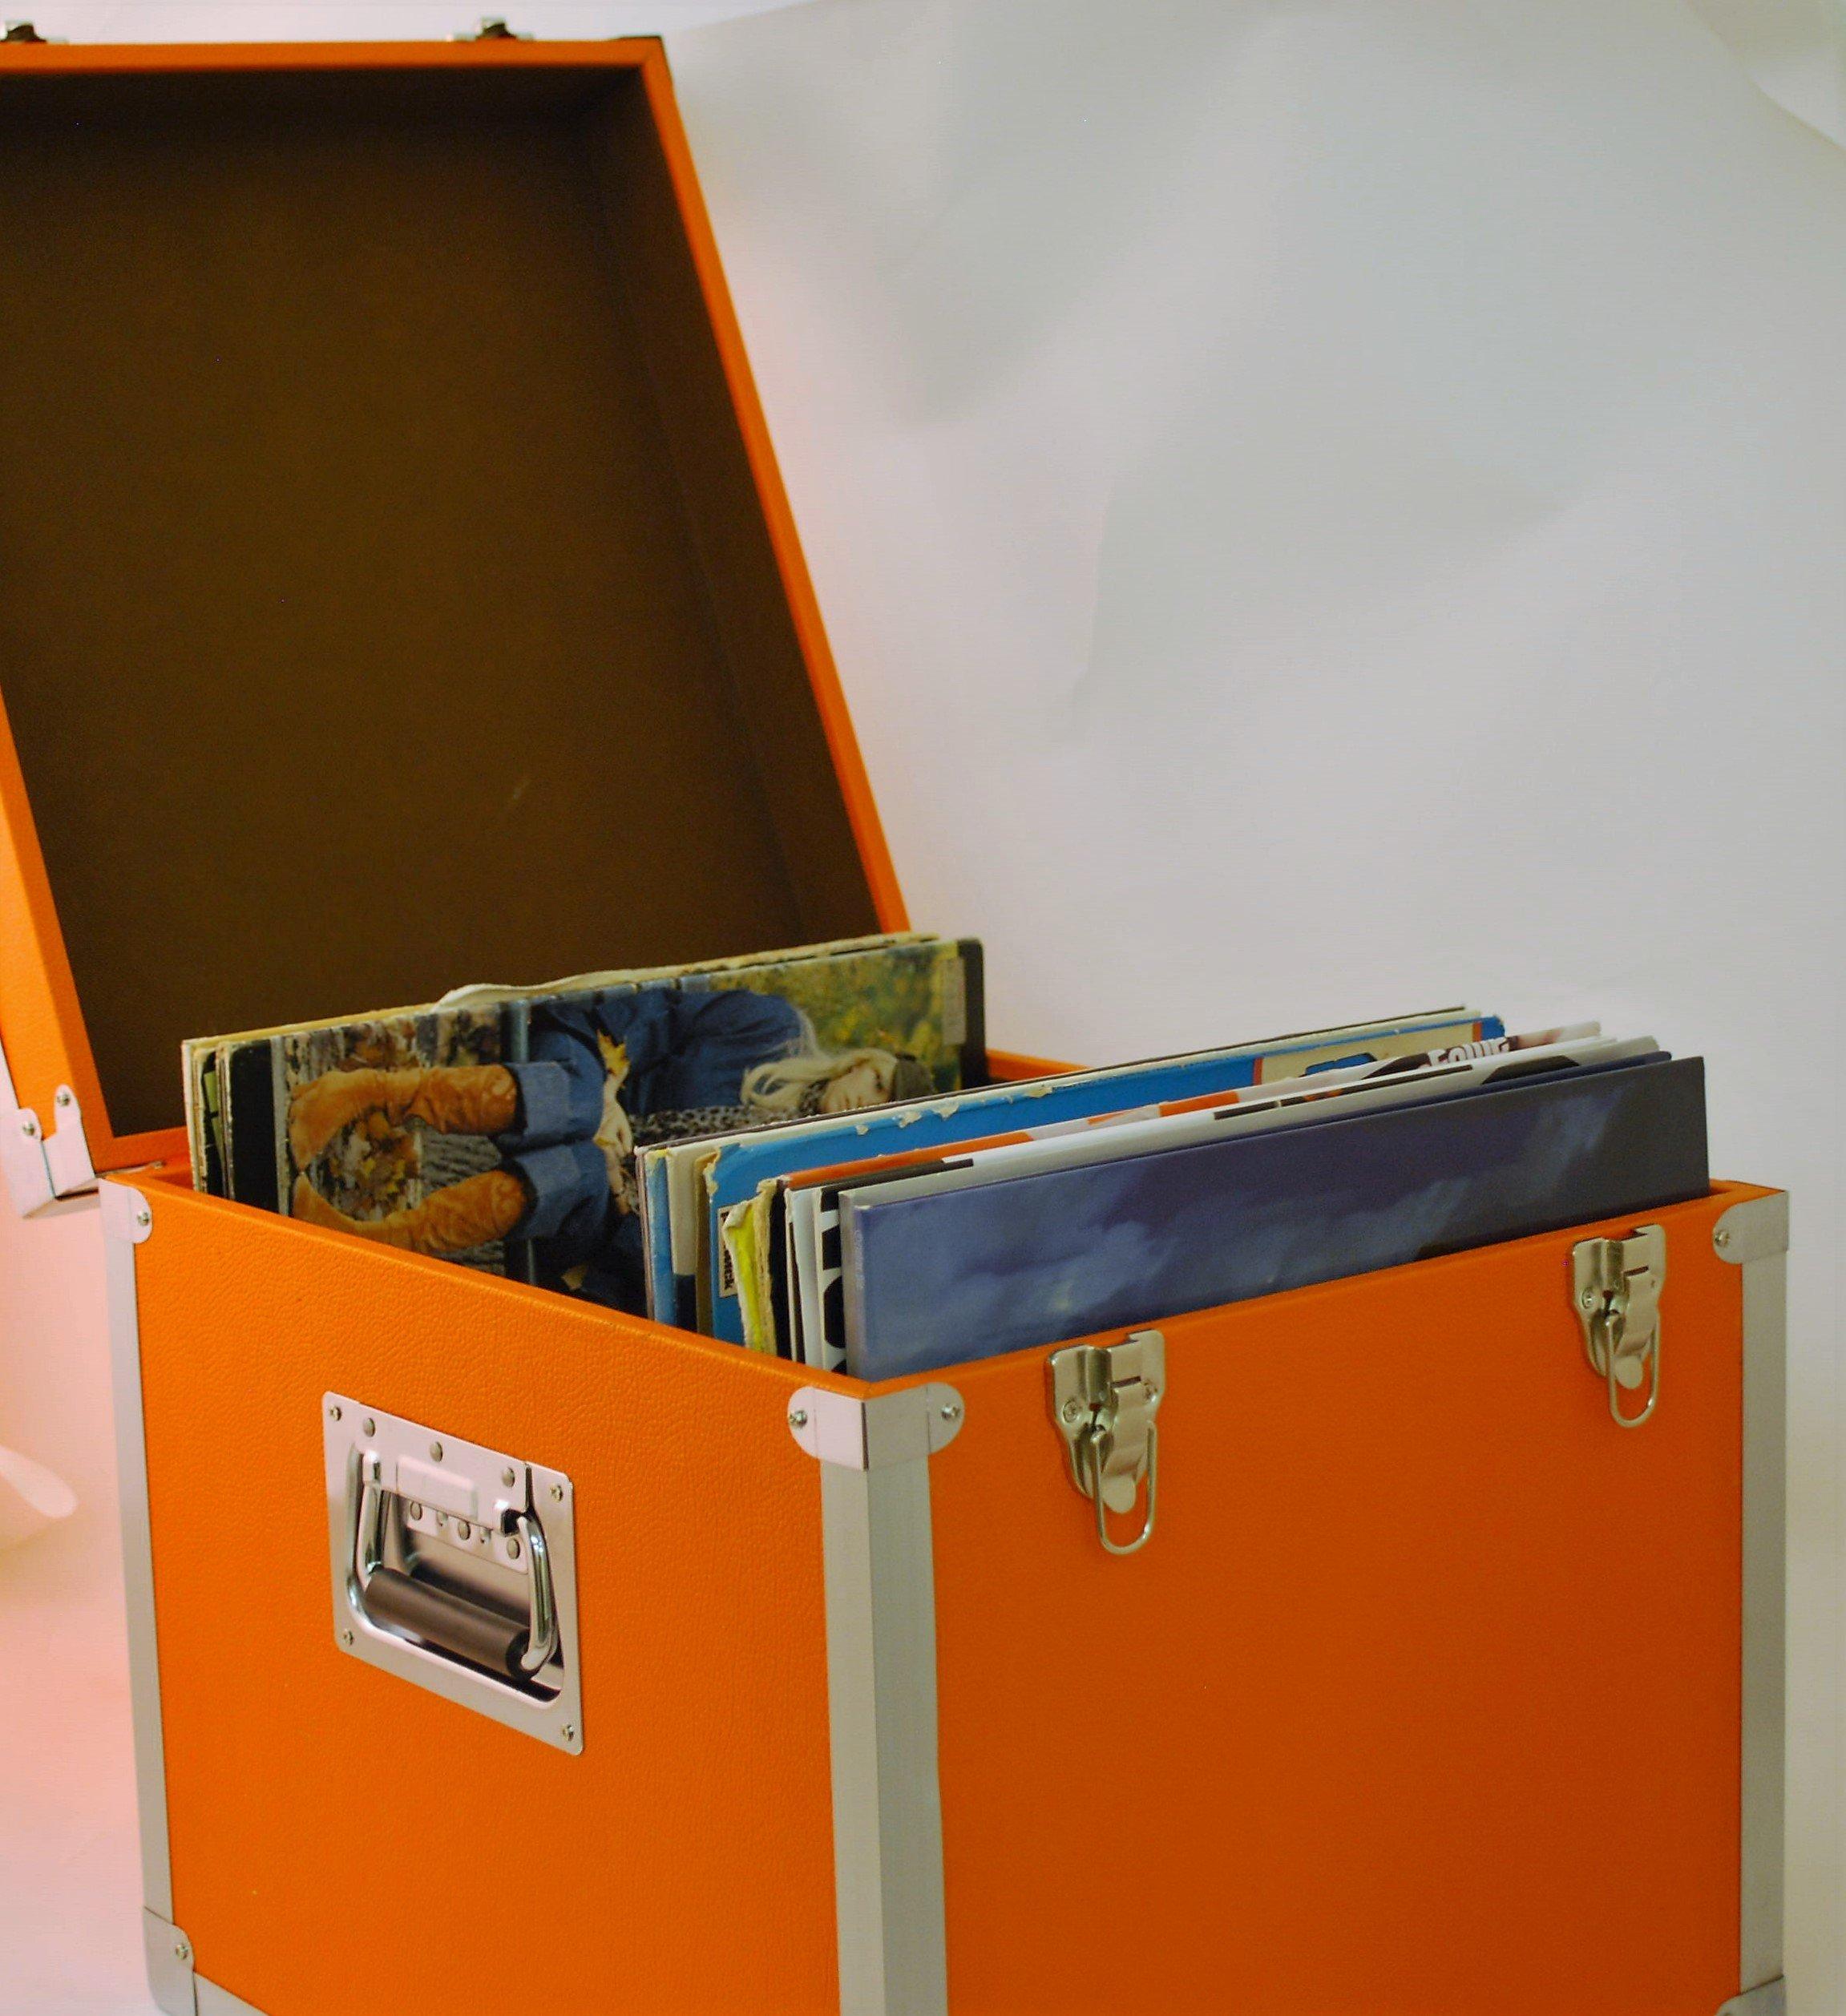 Steepletone SRB100-SRB2 COMBO Large Storage & Carry Case with Smaller LP Case Inside (Orange)